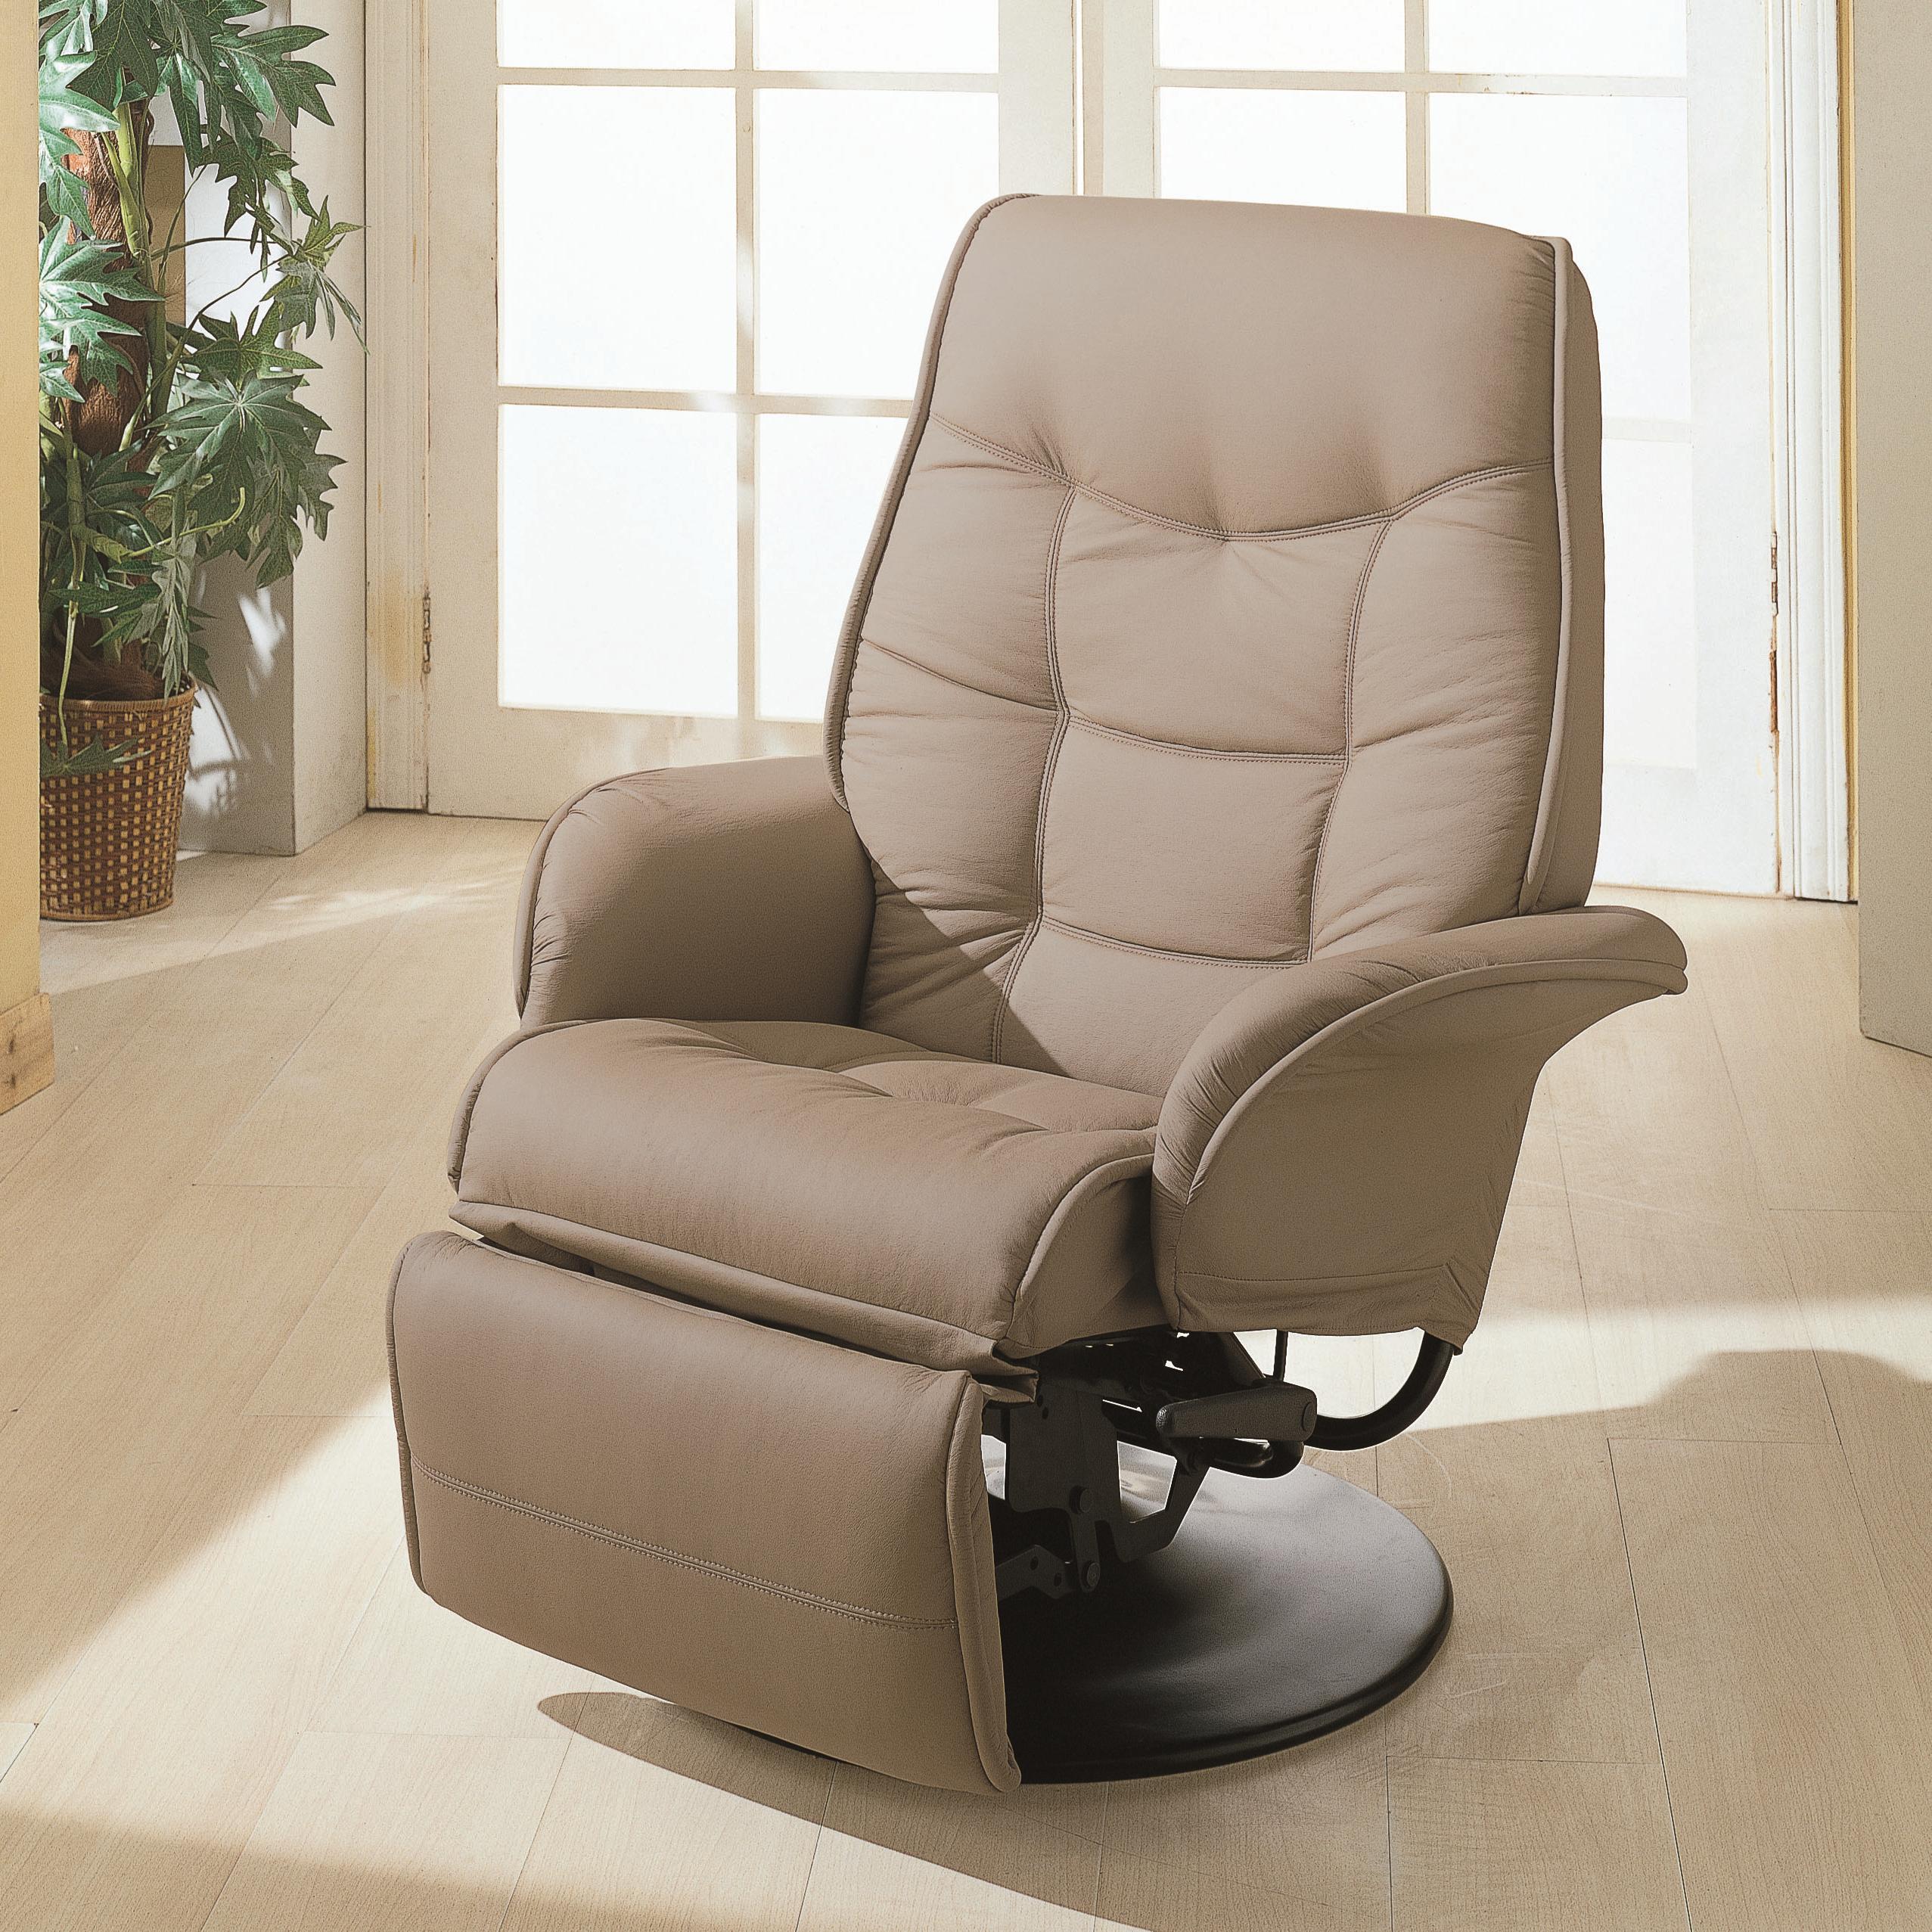 Berri Swivel Recliner by Coaster at Rife's Home Furniture